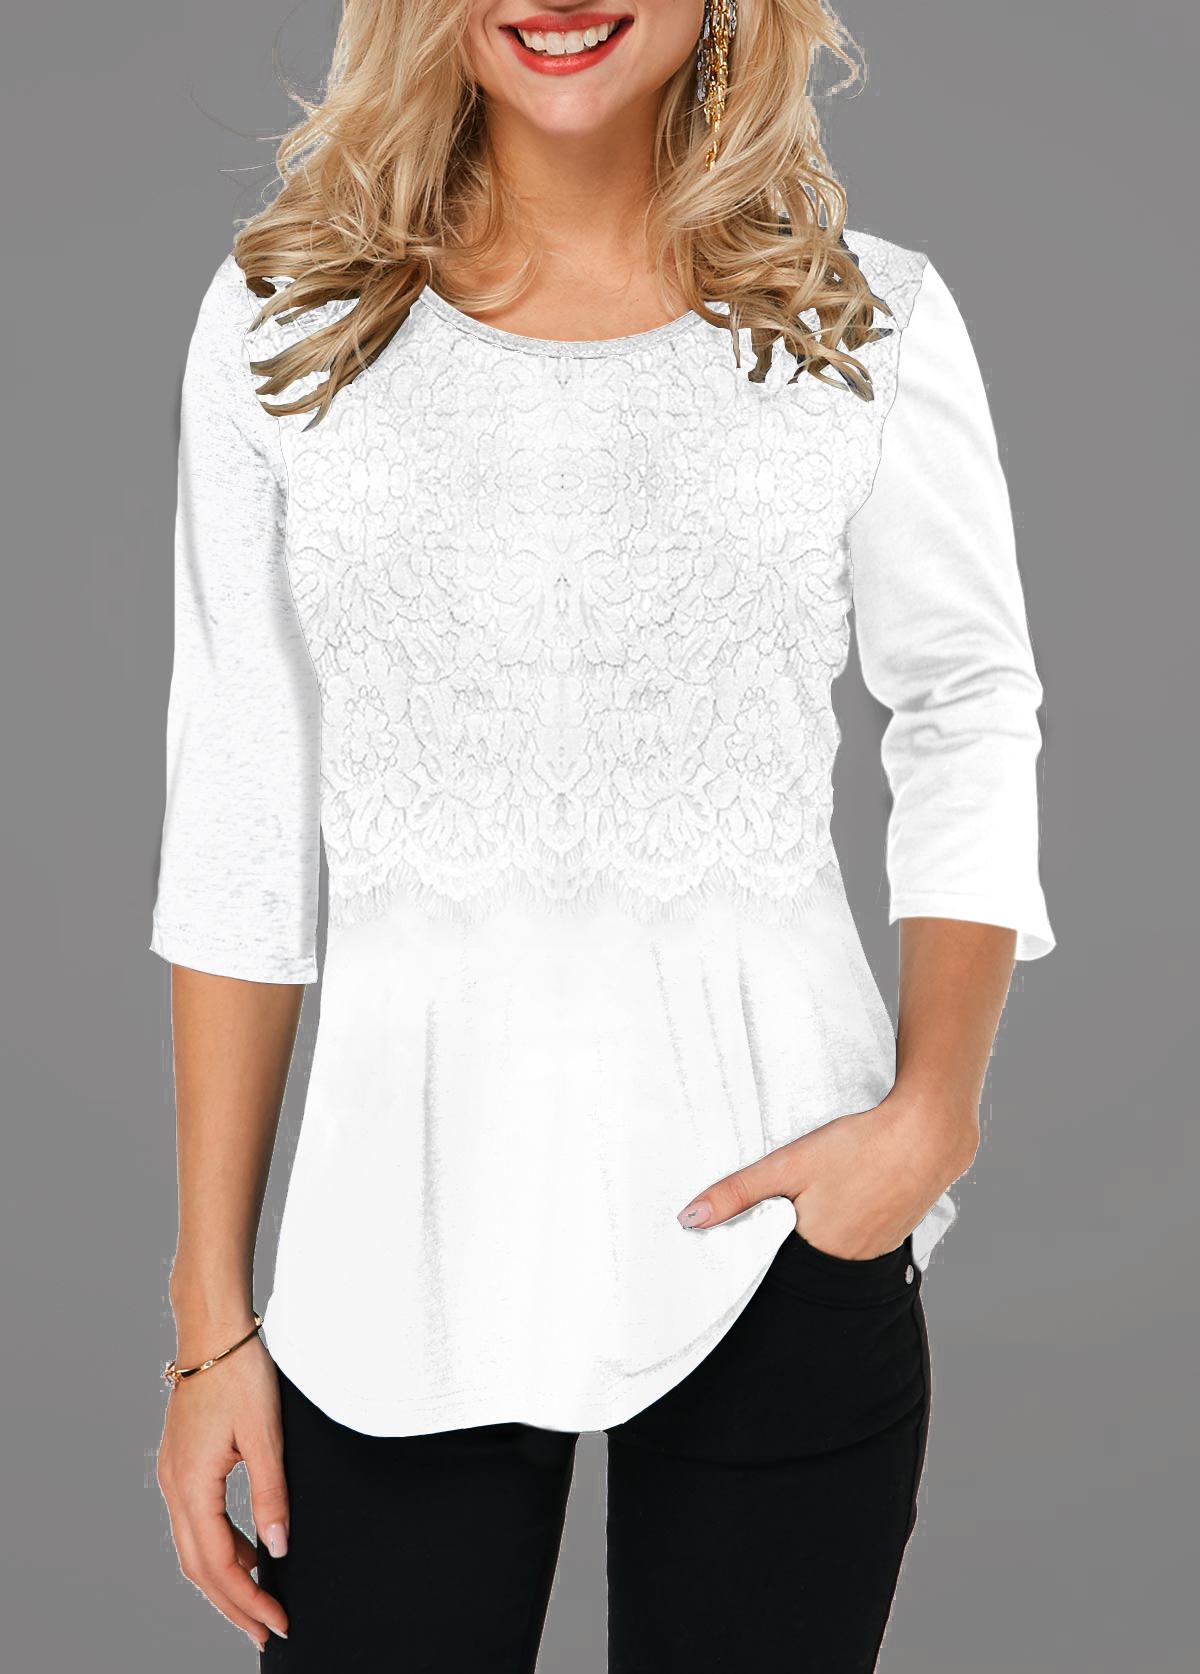 Lace Panel Round Neck White T Shirt